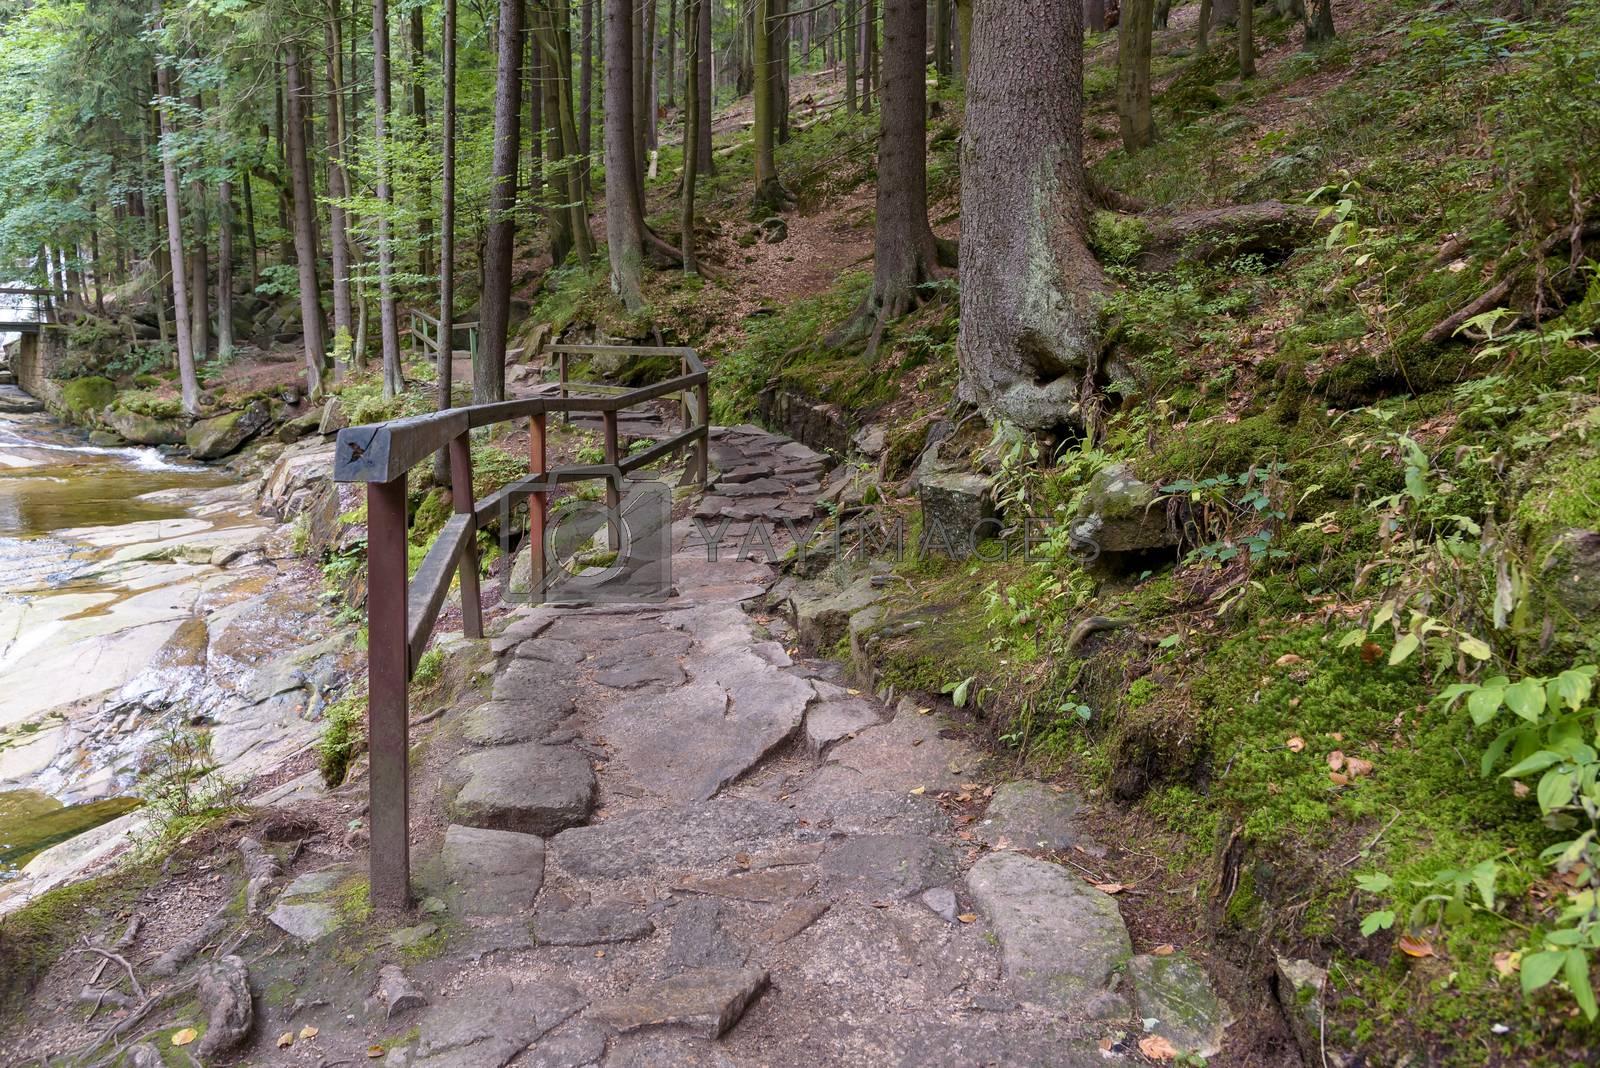 Forest path to Mumlava Waterfalls near Harrachov in Giant Mountains in Czech Republic